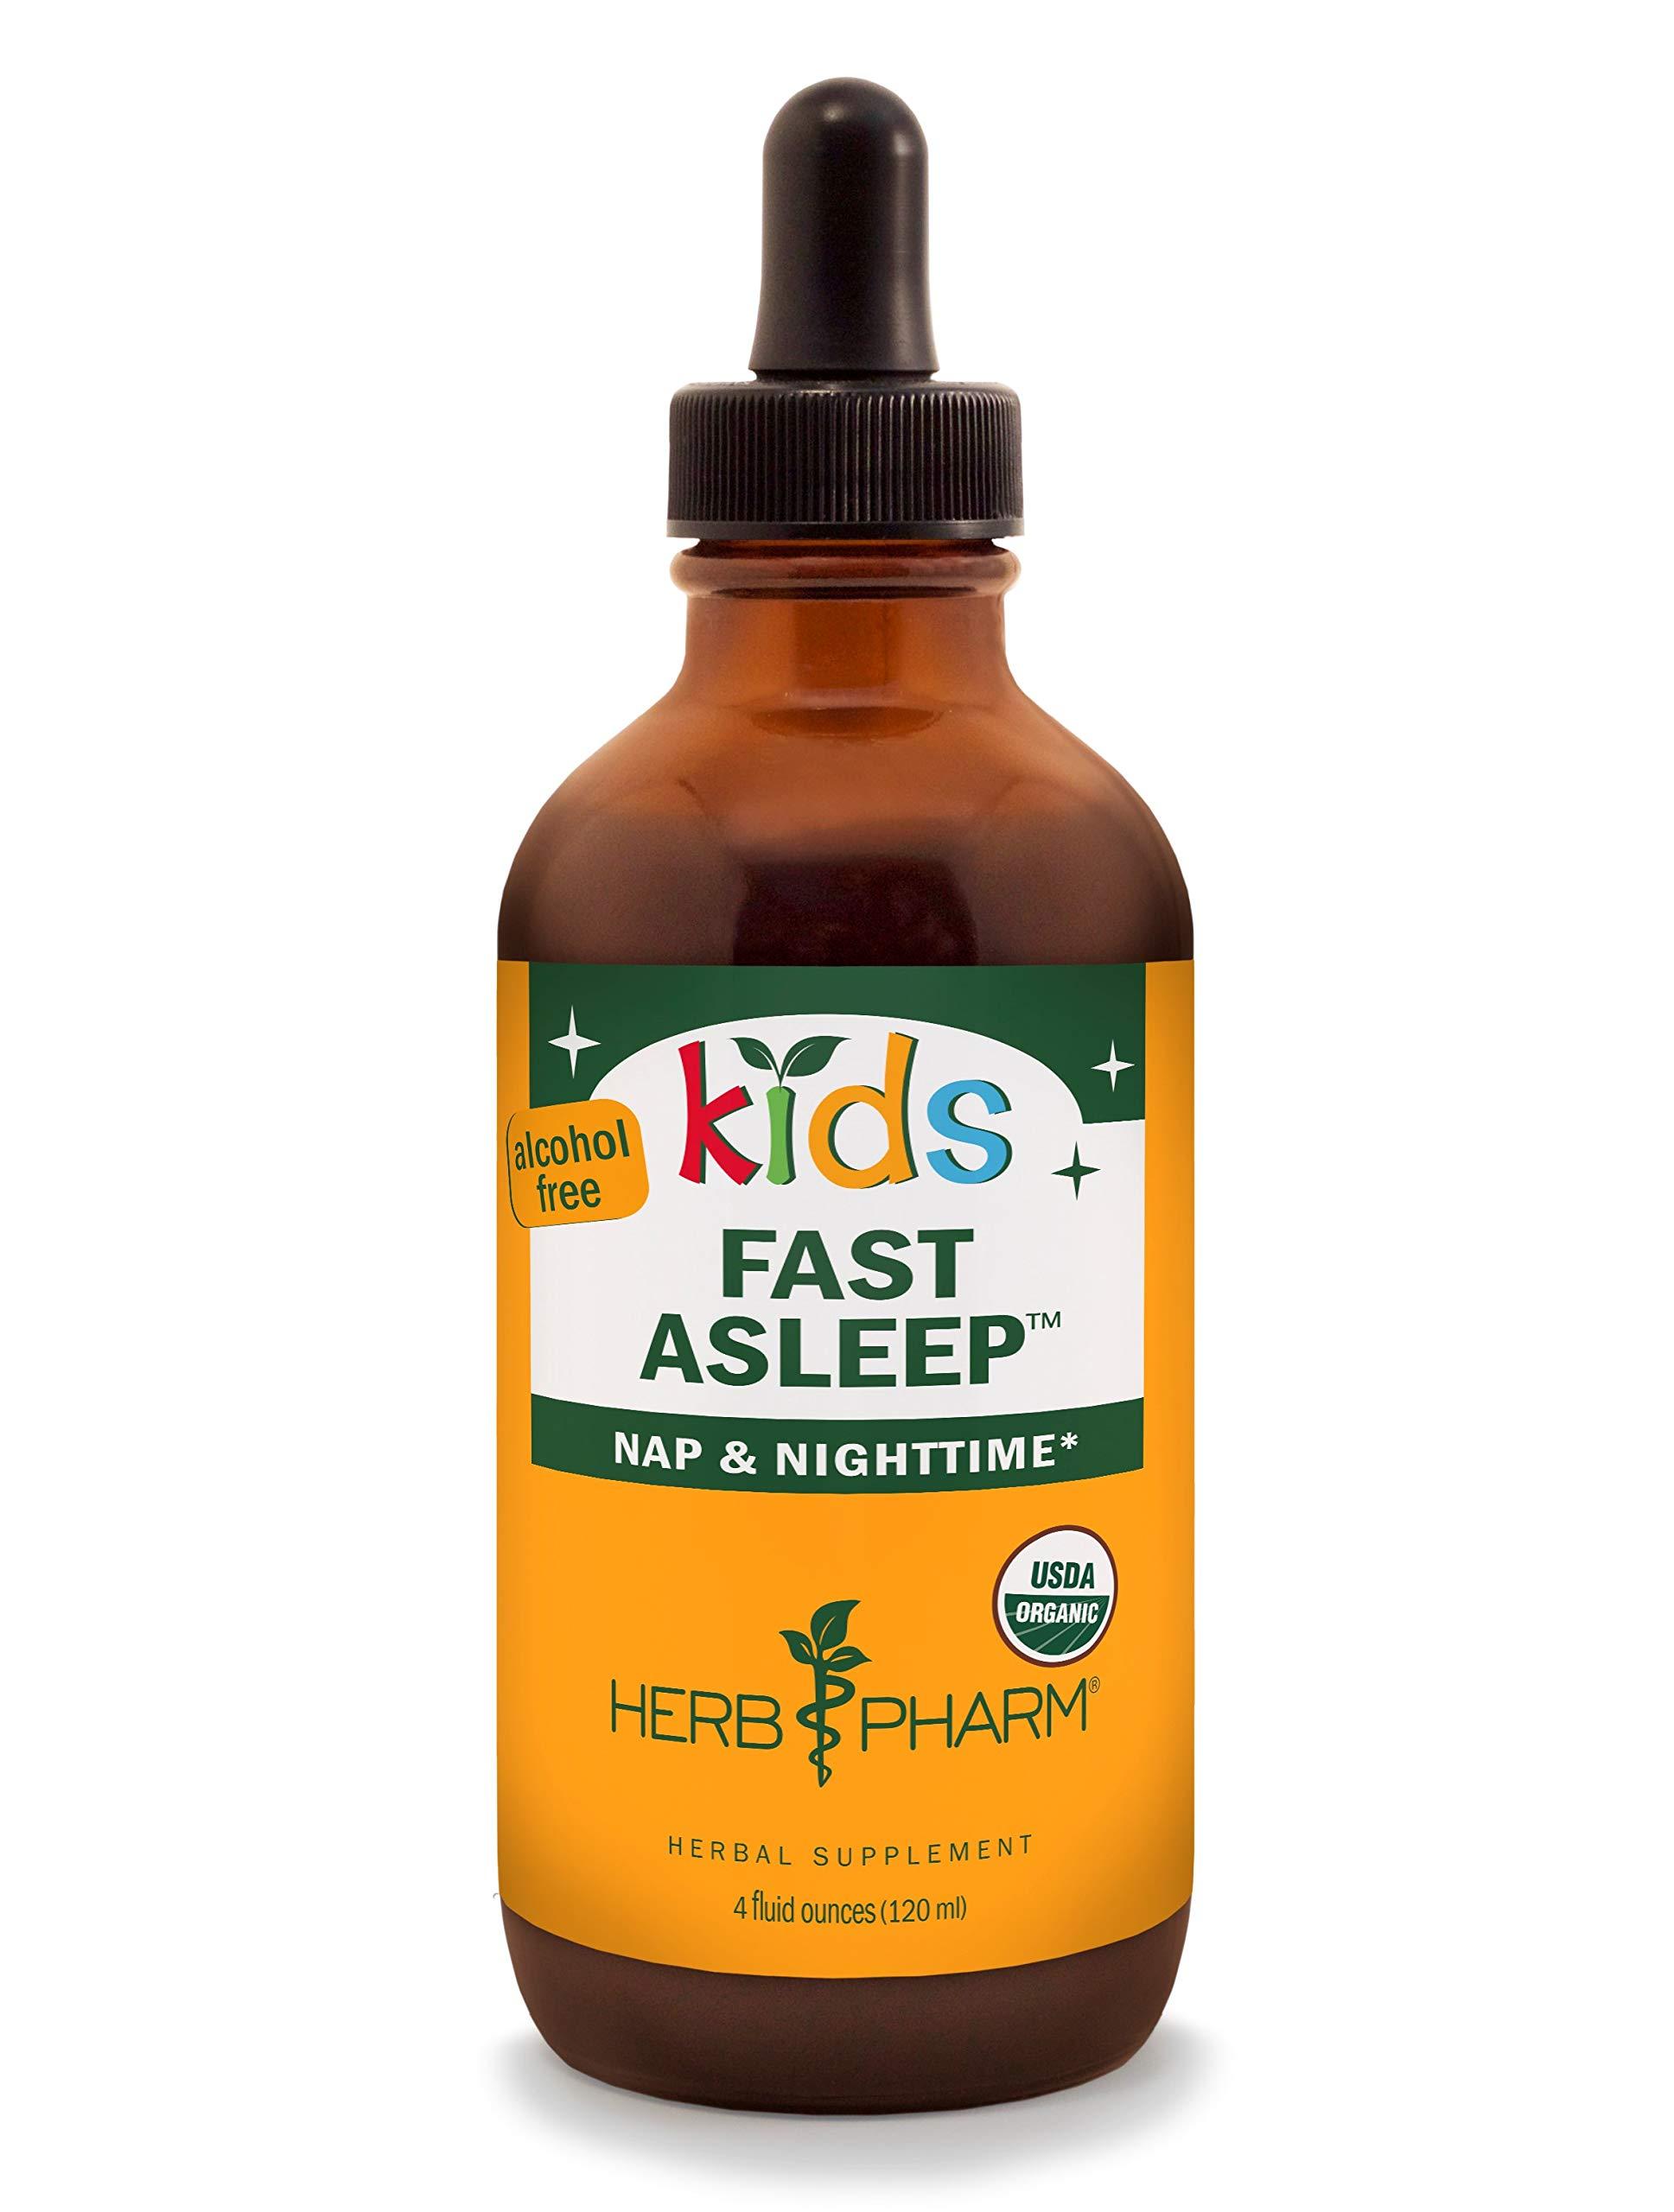 Herb Pharm Kids Certified-Organic Alcohol-Free Fast Asleep Liquid Herbal Formula, 4 Ounce